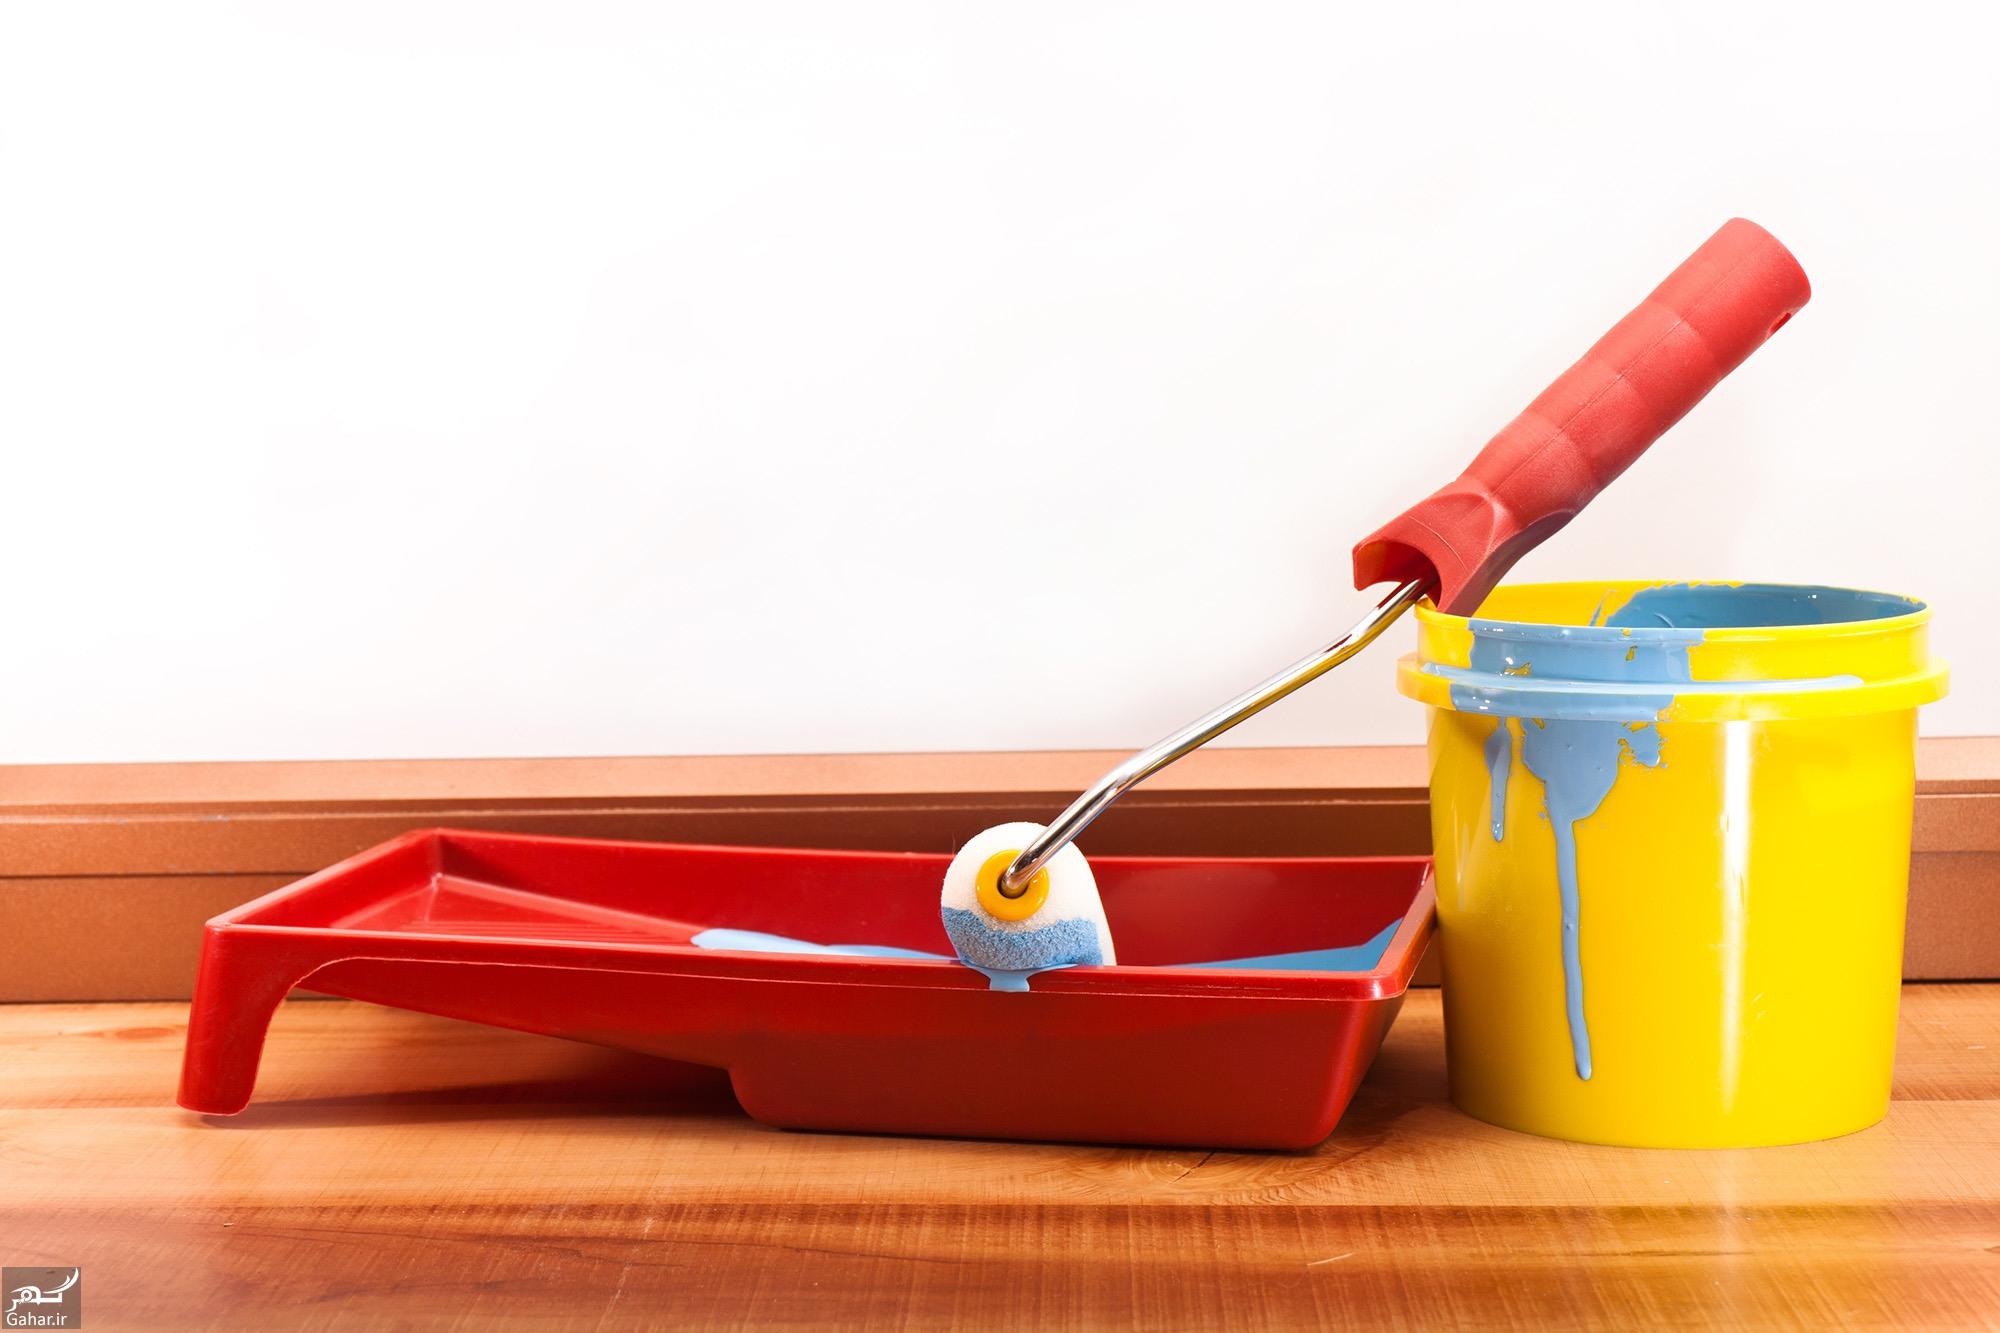 Acrylic Color 3 3  نکات مهمی در مورد رنگ آمیزی و نقاشی ساختمان